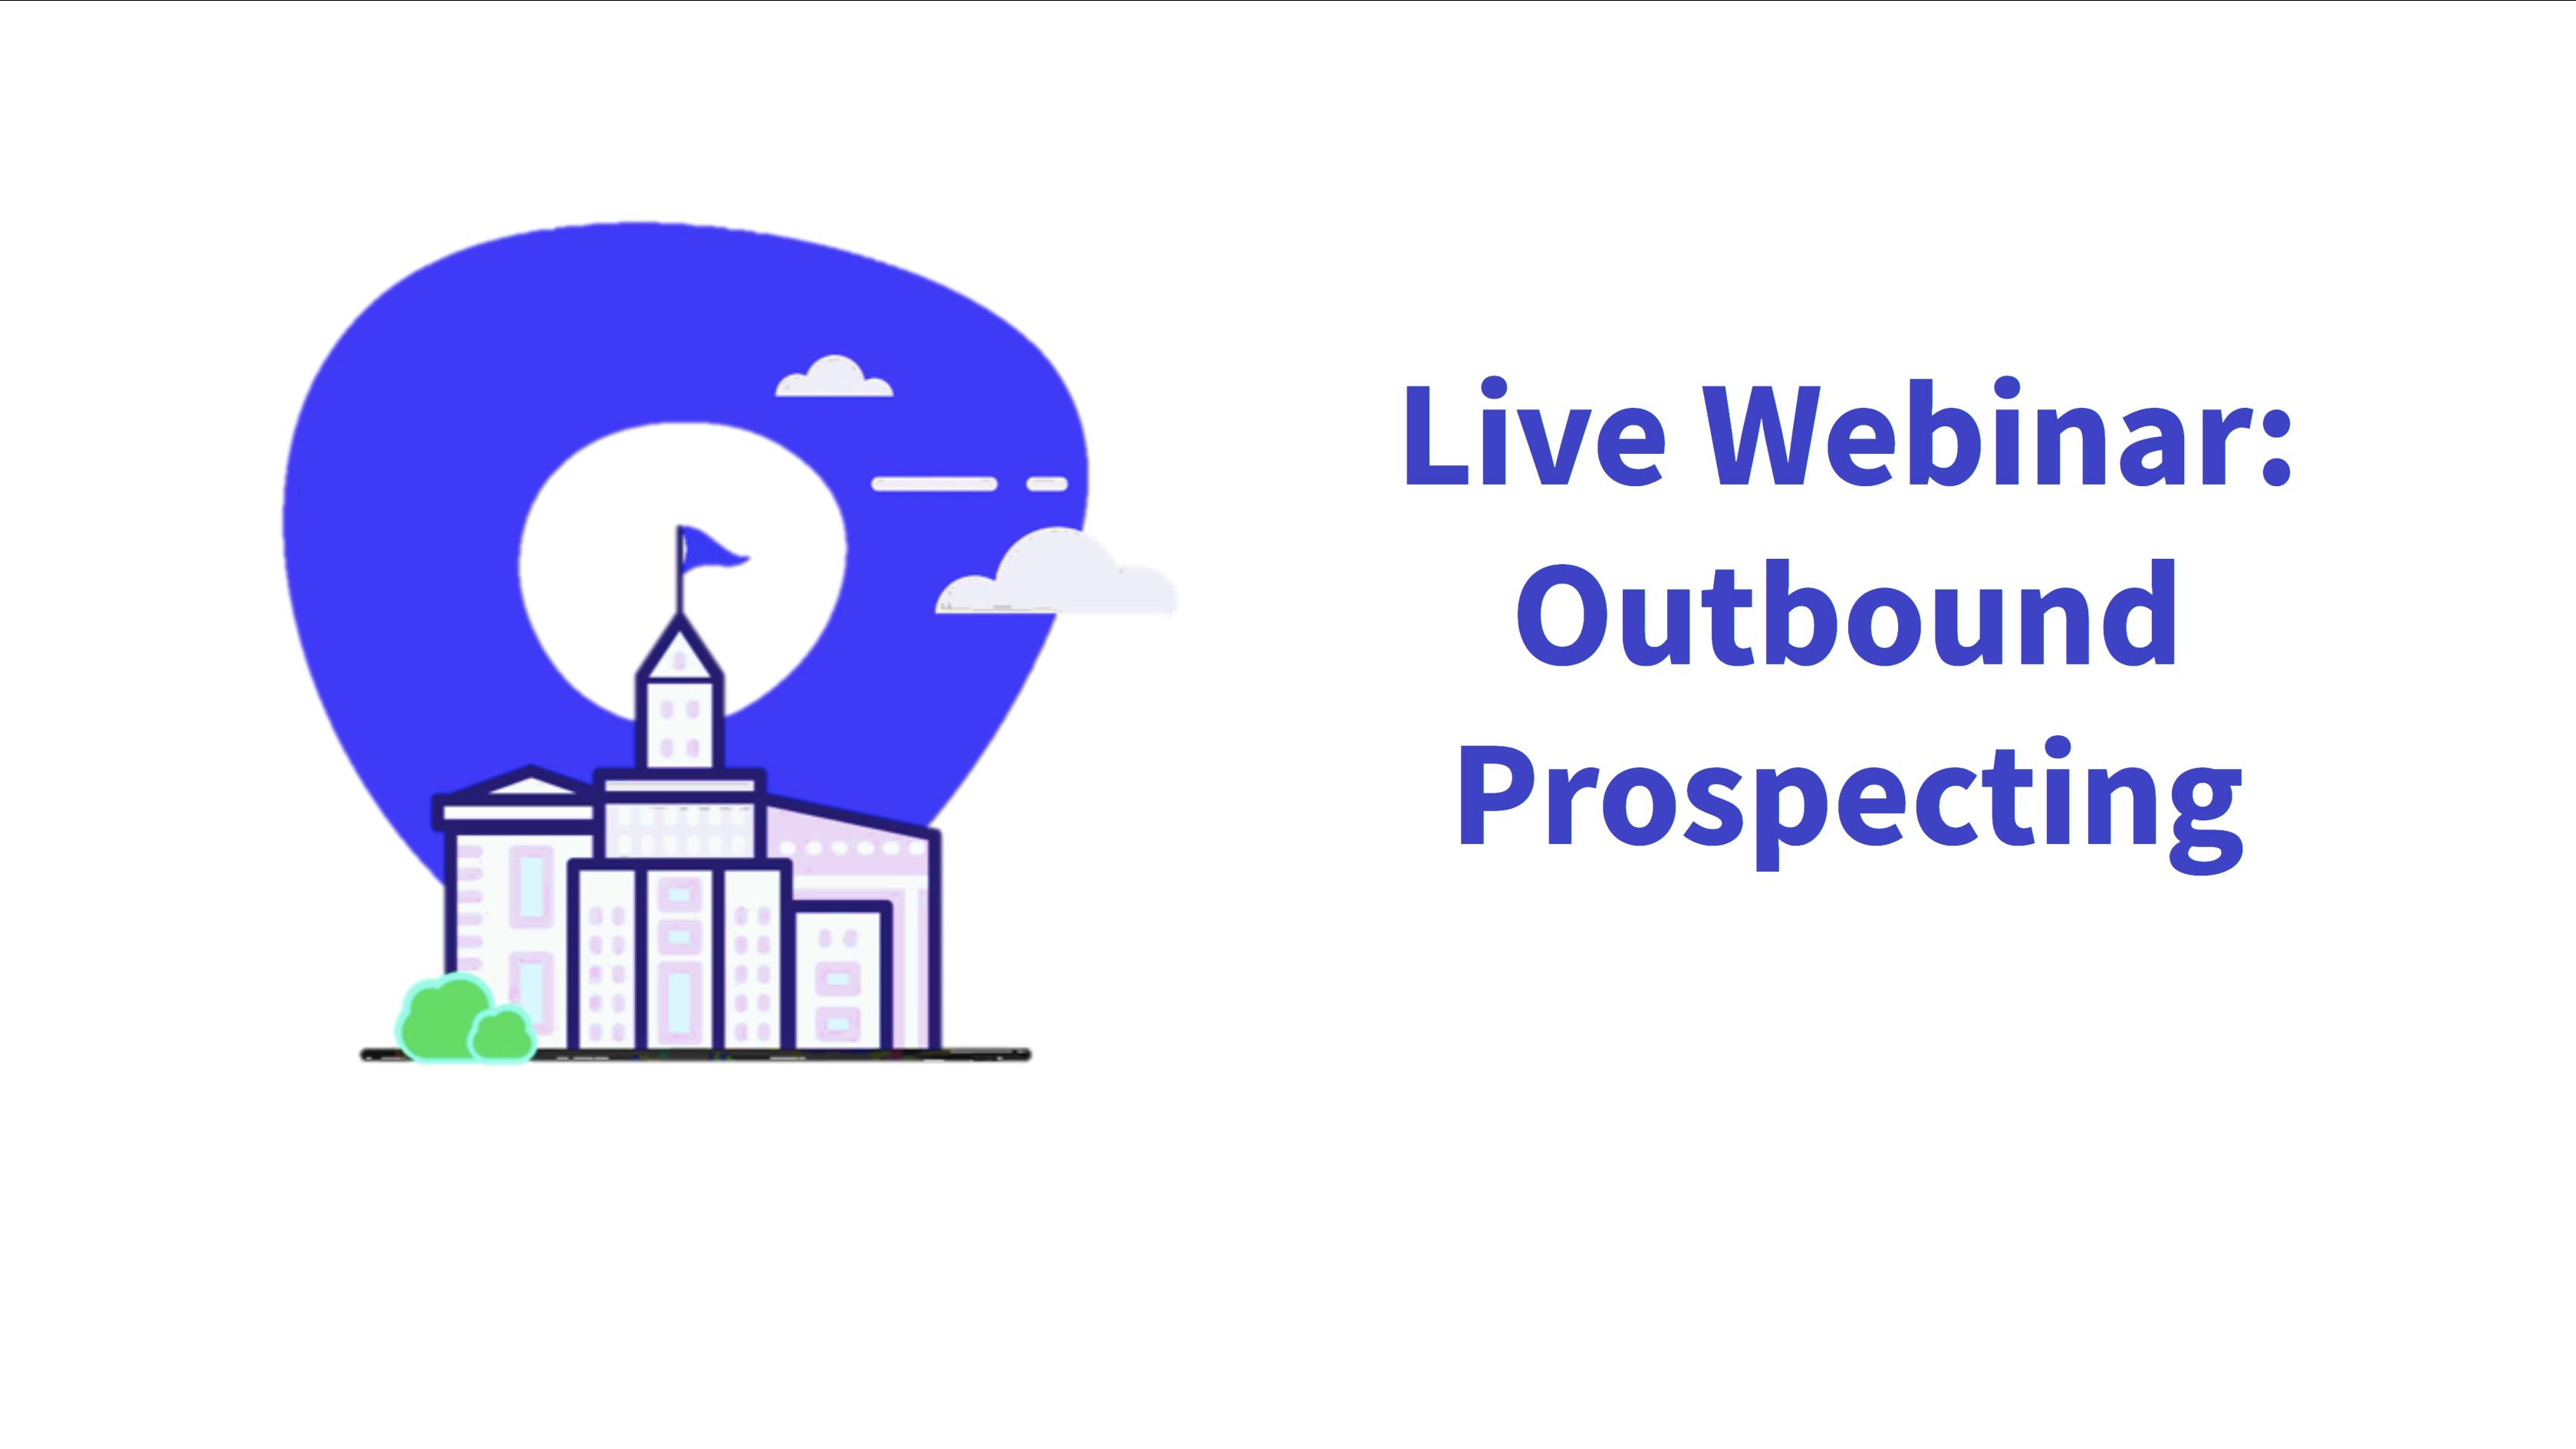 Live Webinar: Outbound Prospecting